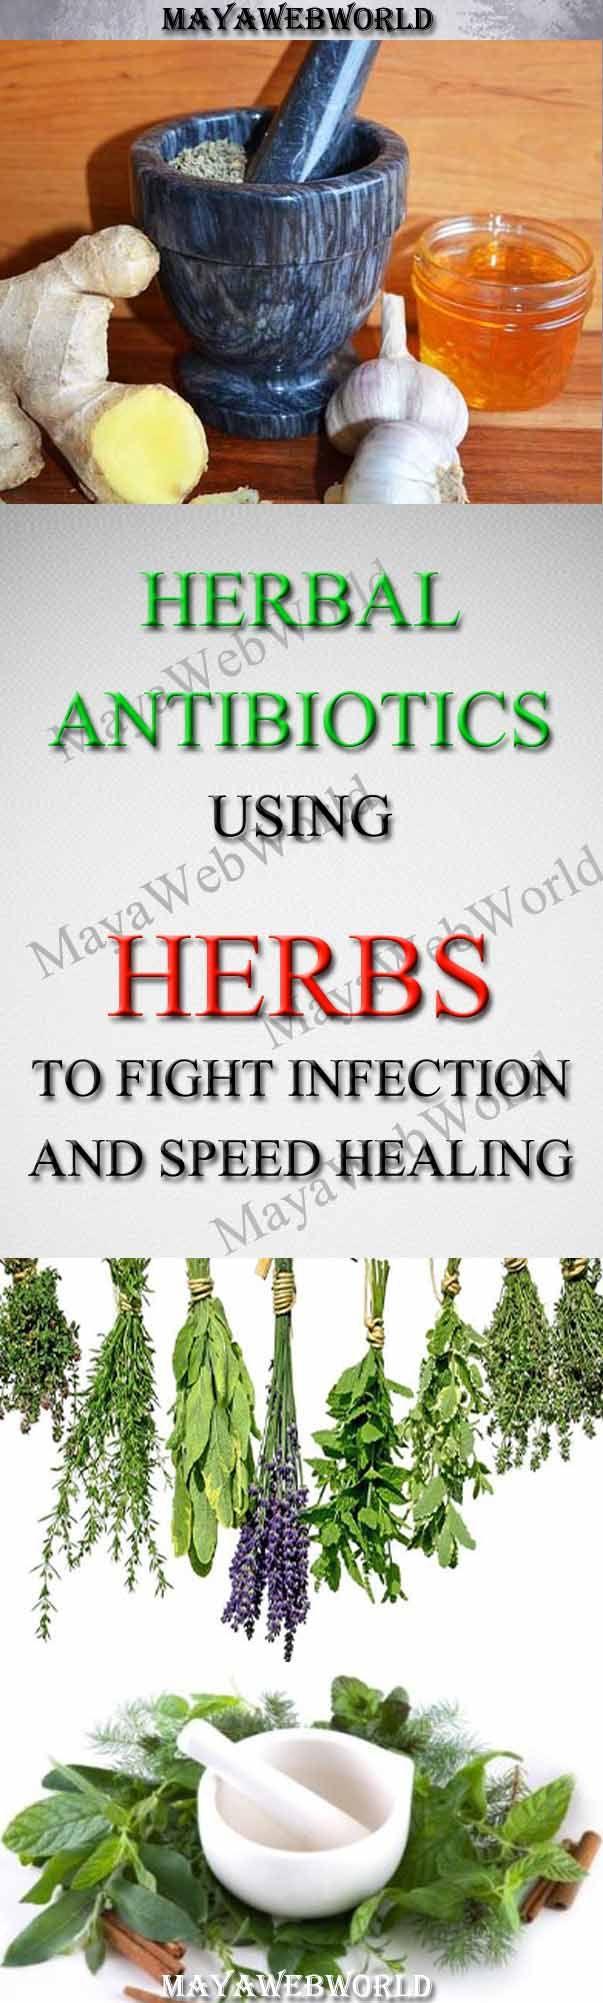 #HerbalAntibiotics – Using Herbs to Fight Infection and Speed Healing #NaturalRemedies